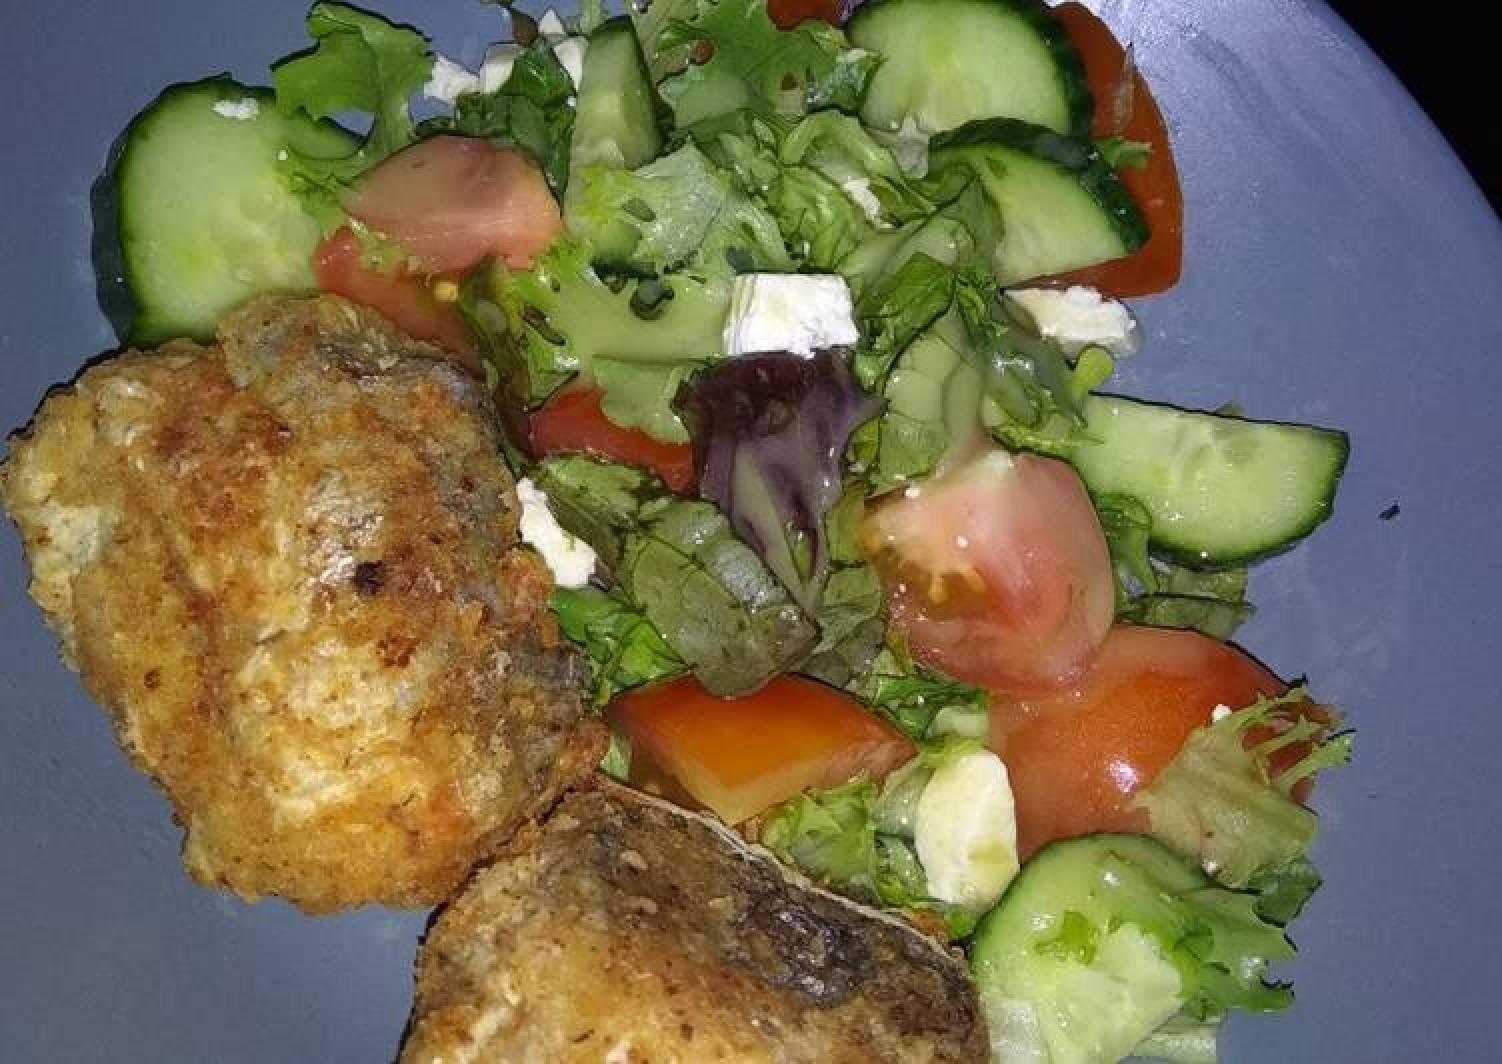 Tasty Fried Fish